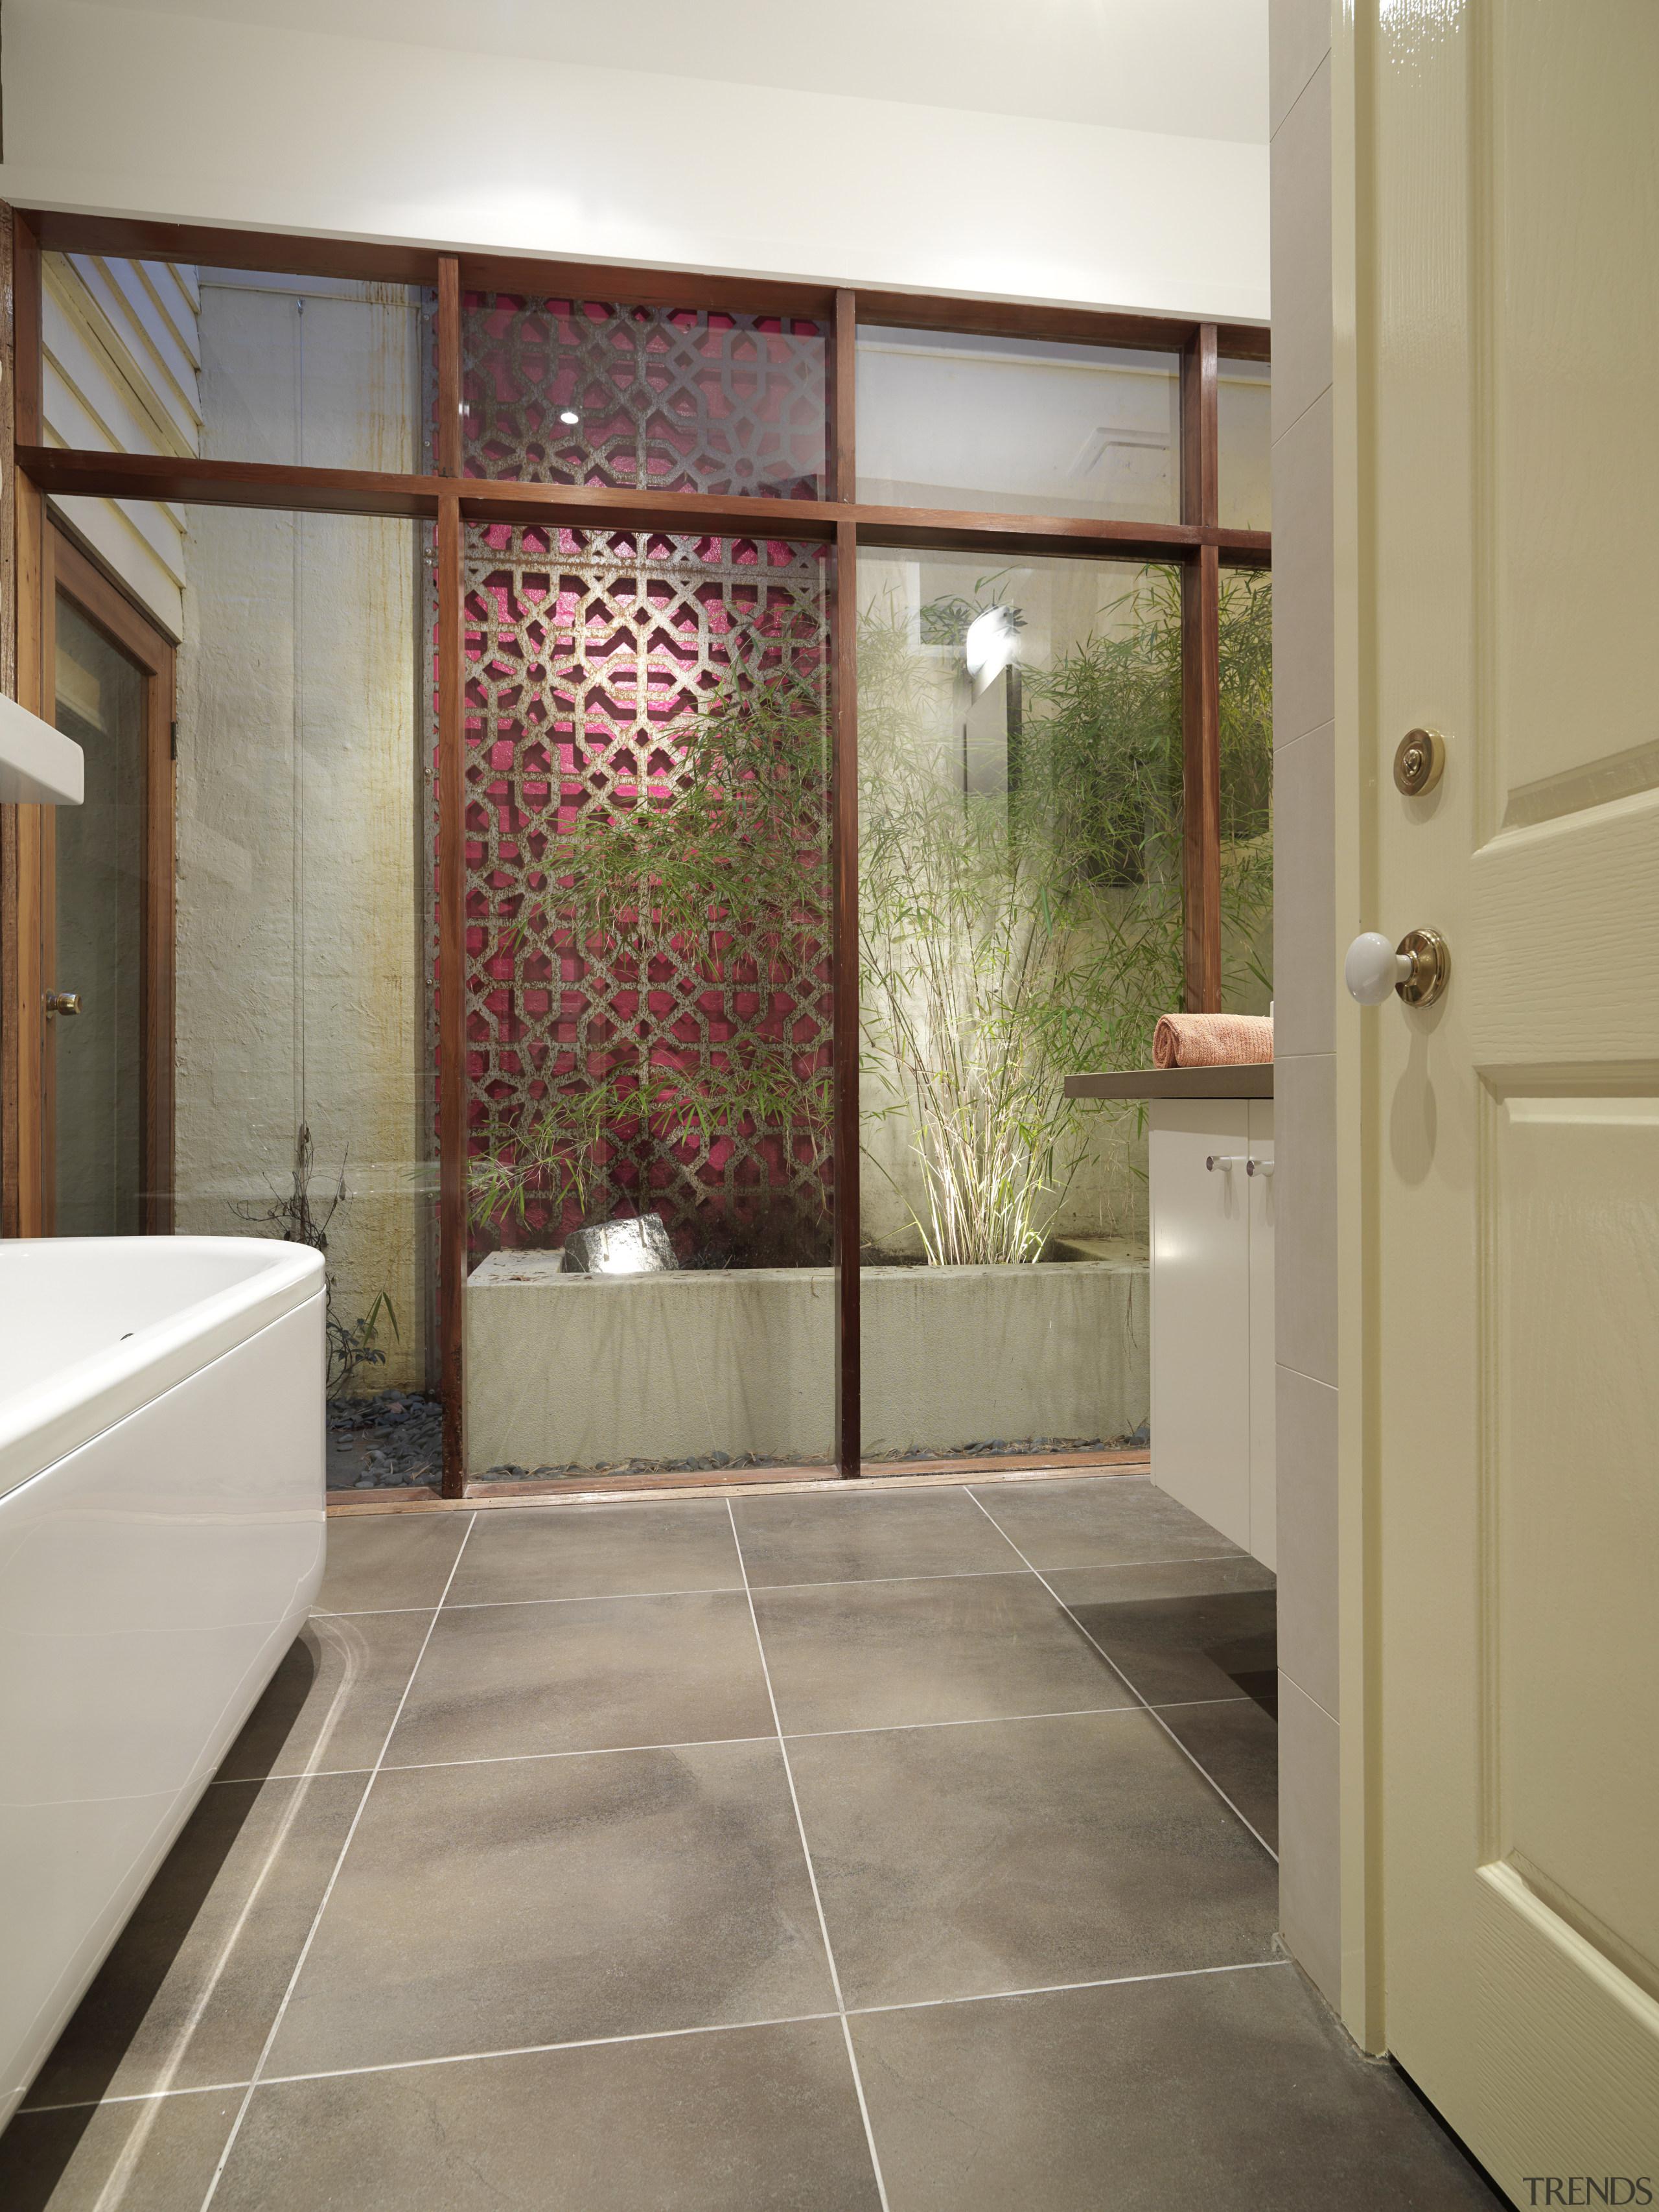 View of renovated bathroom, featuring bathtub, ceramic tiled architecture, bathroom, ceiling, door, floor, flooring, interior design, room, tile, wall, gray, brown